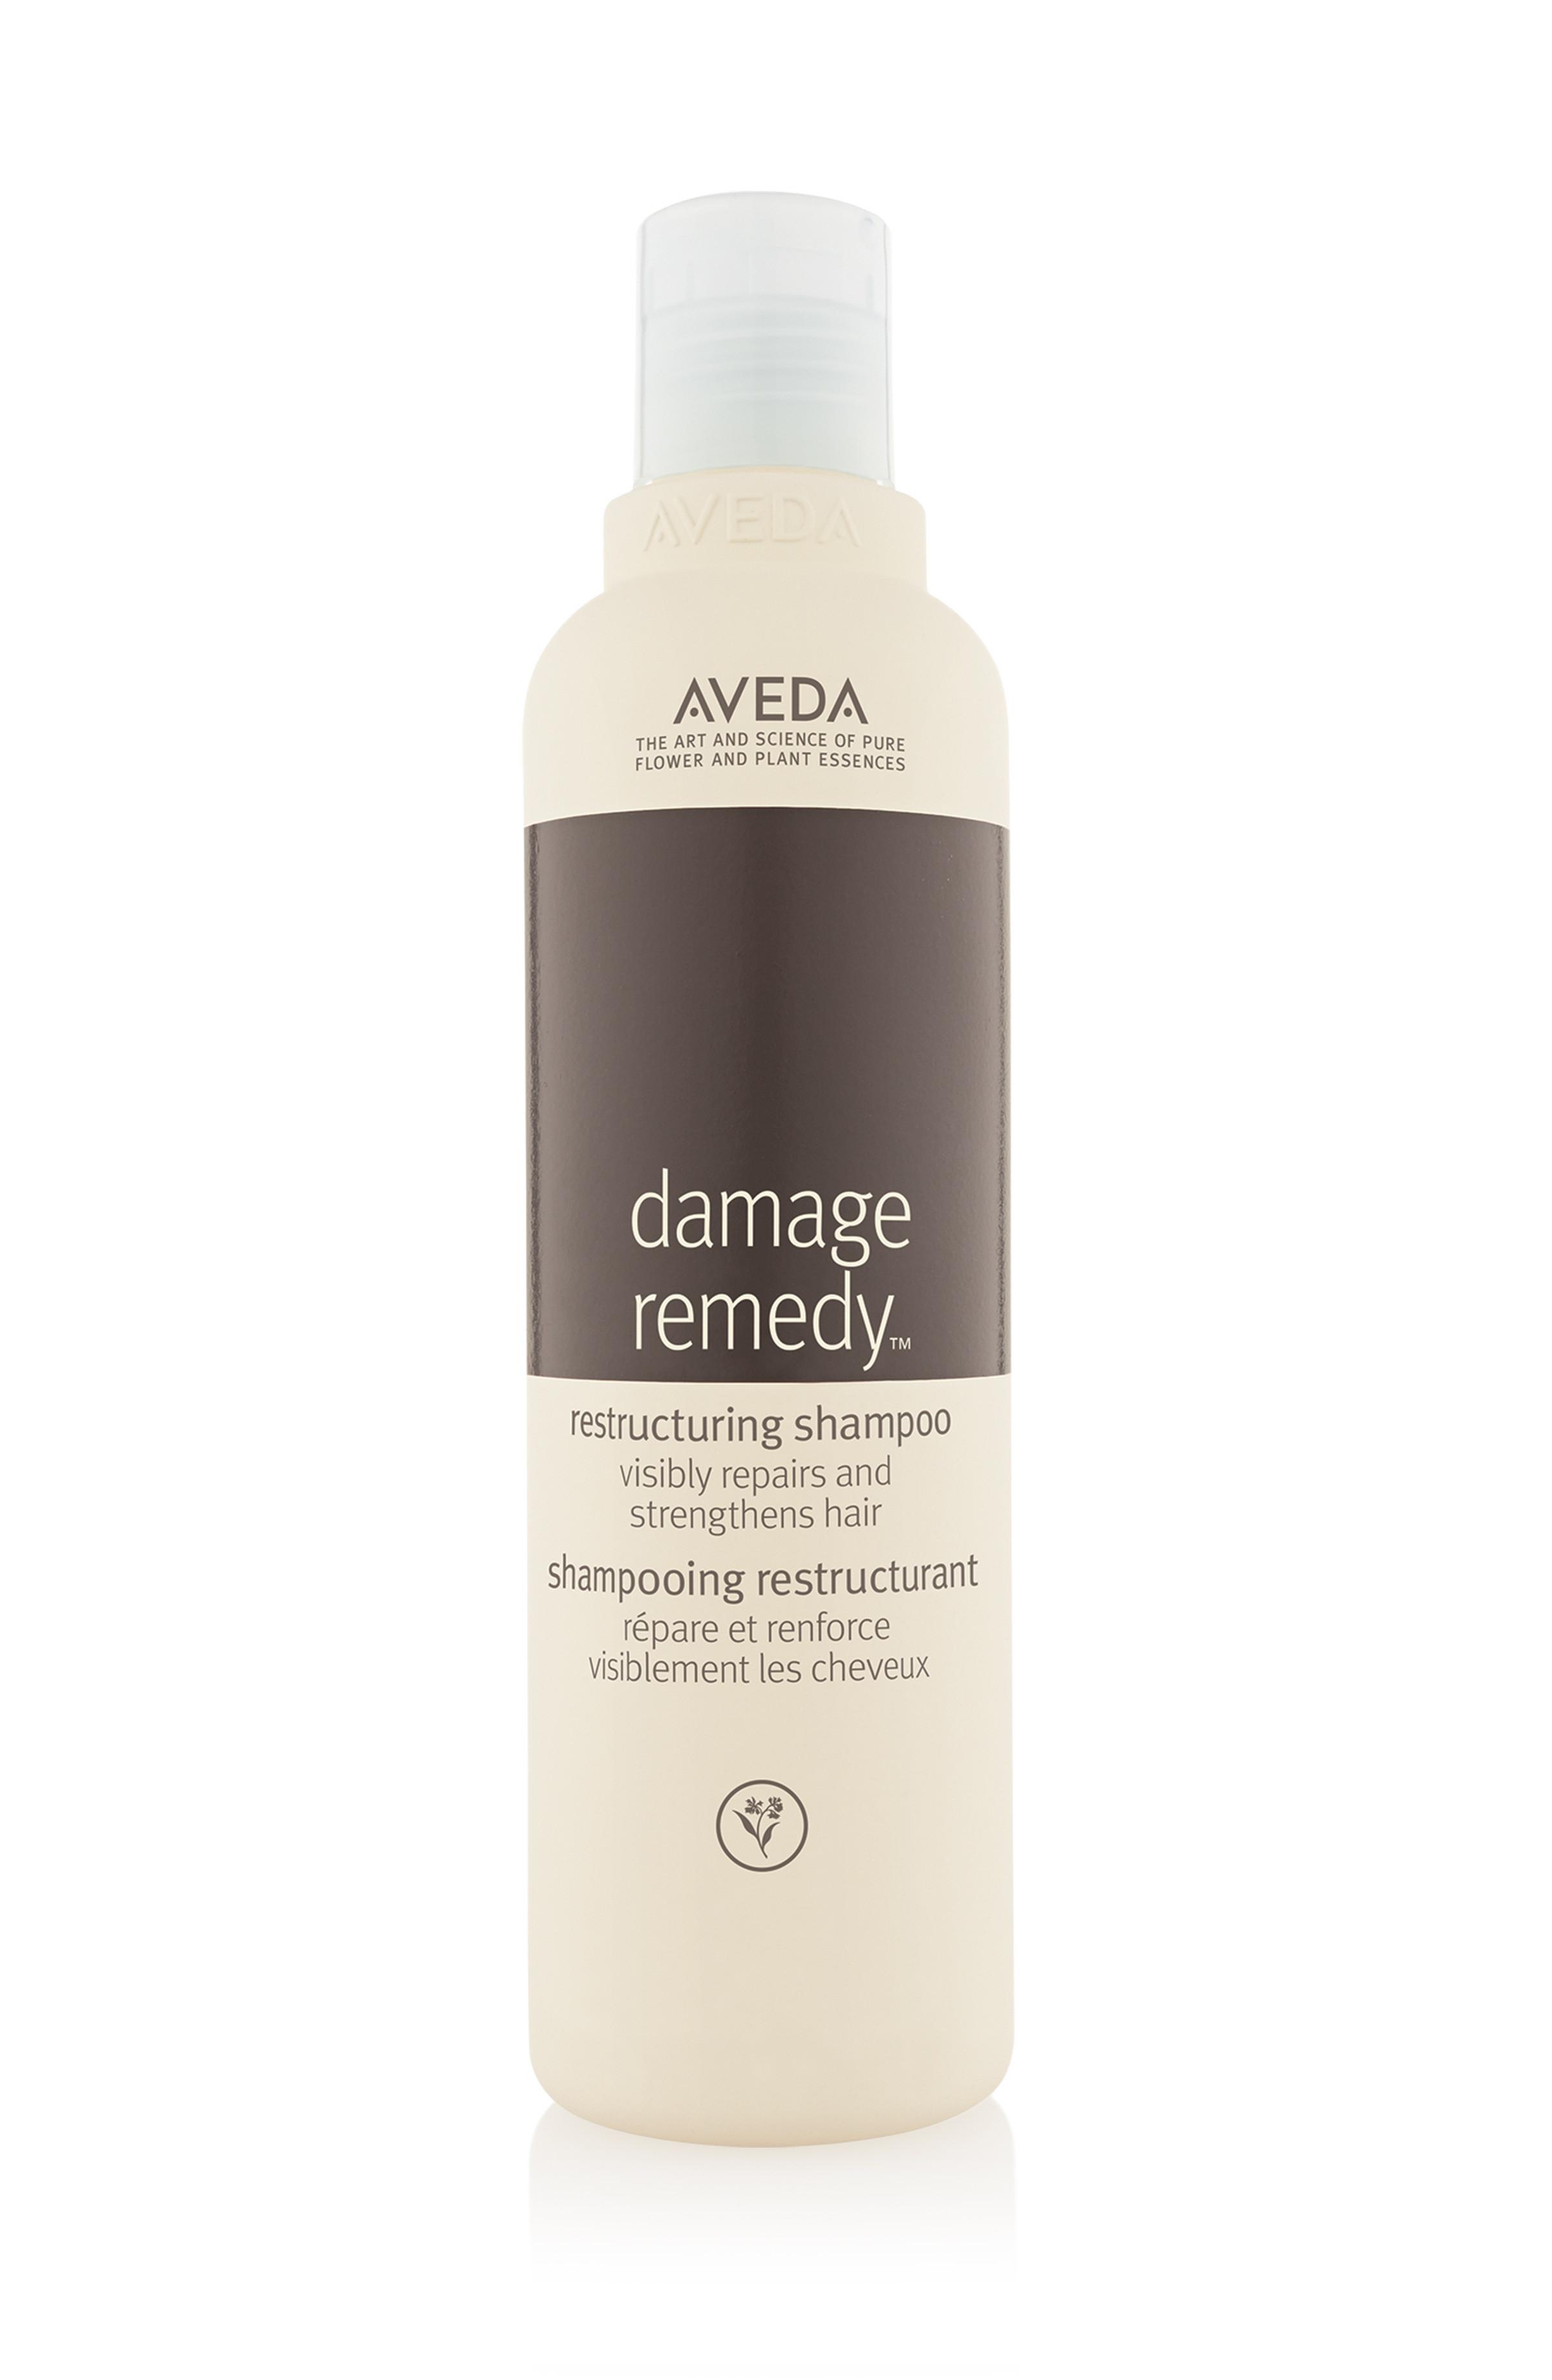 Aveda damage remedy shampoo ristrutturante 250 ml, Bianco/Marrone, large image number 0